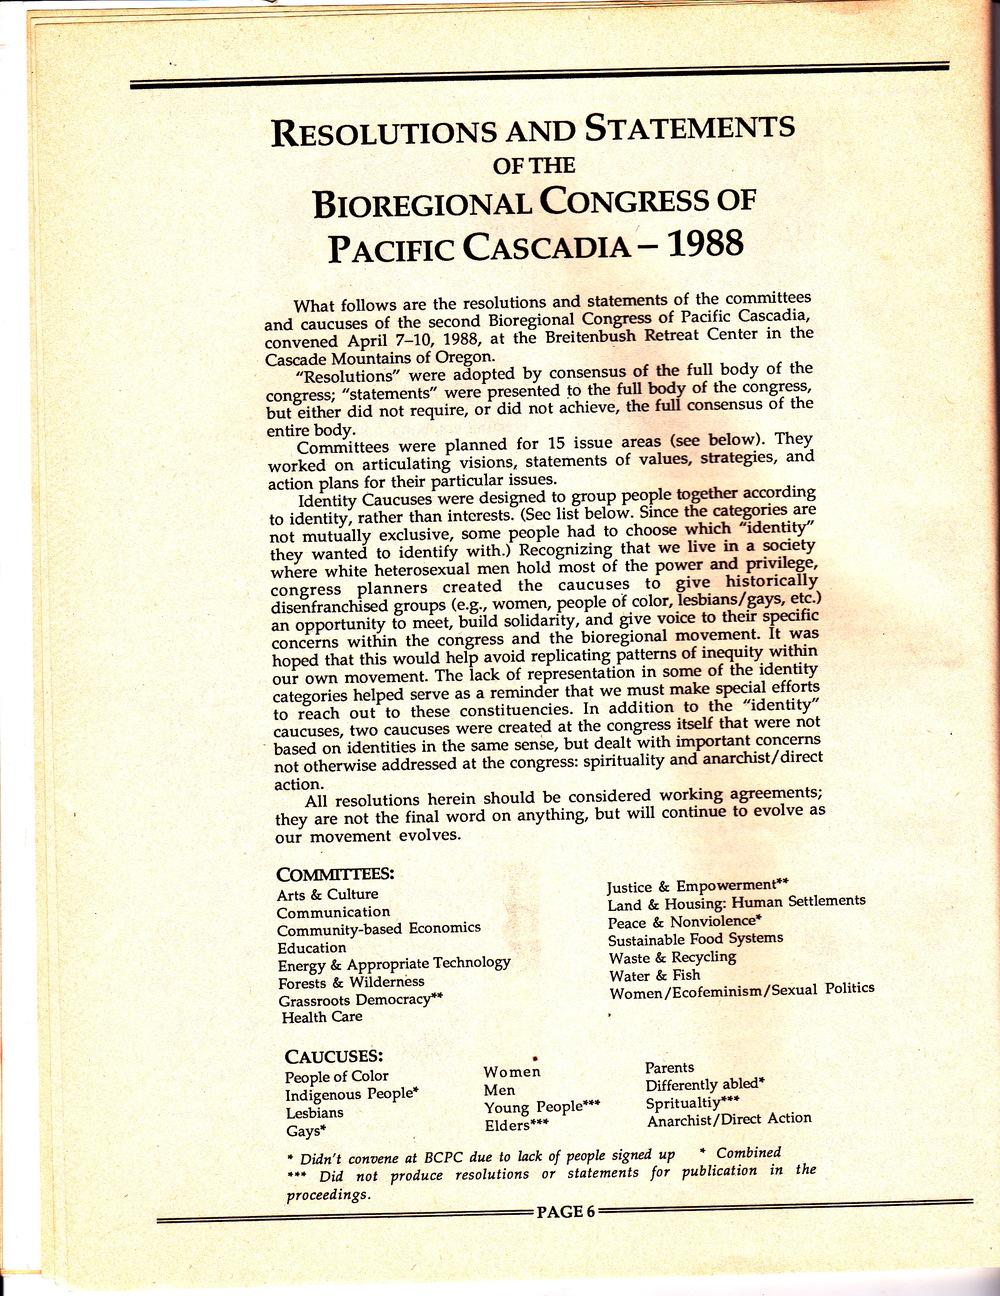 Cascadia Bioregional Congress 1986 Proceedings_0026.jpg